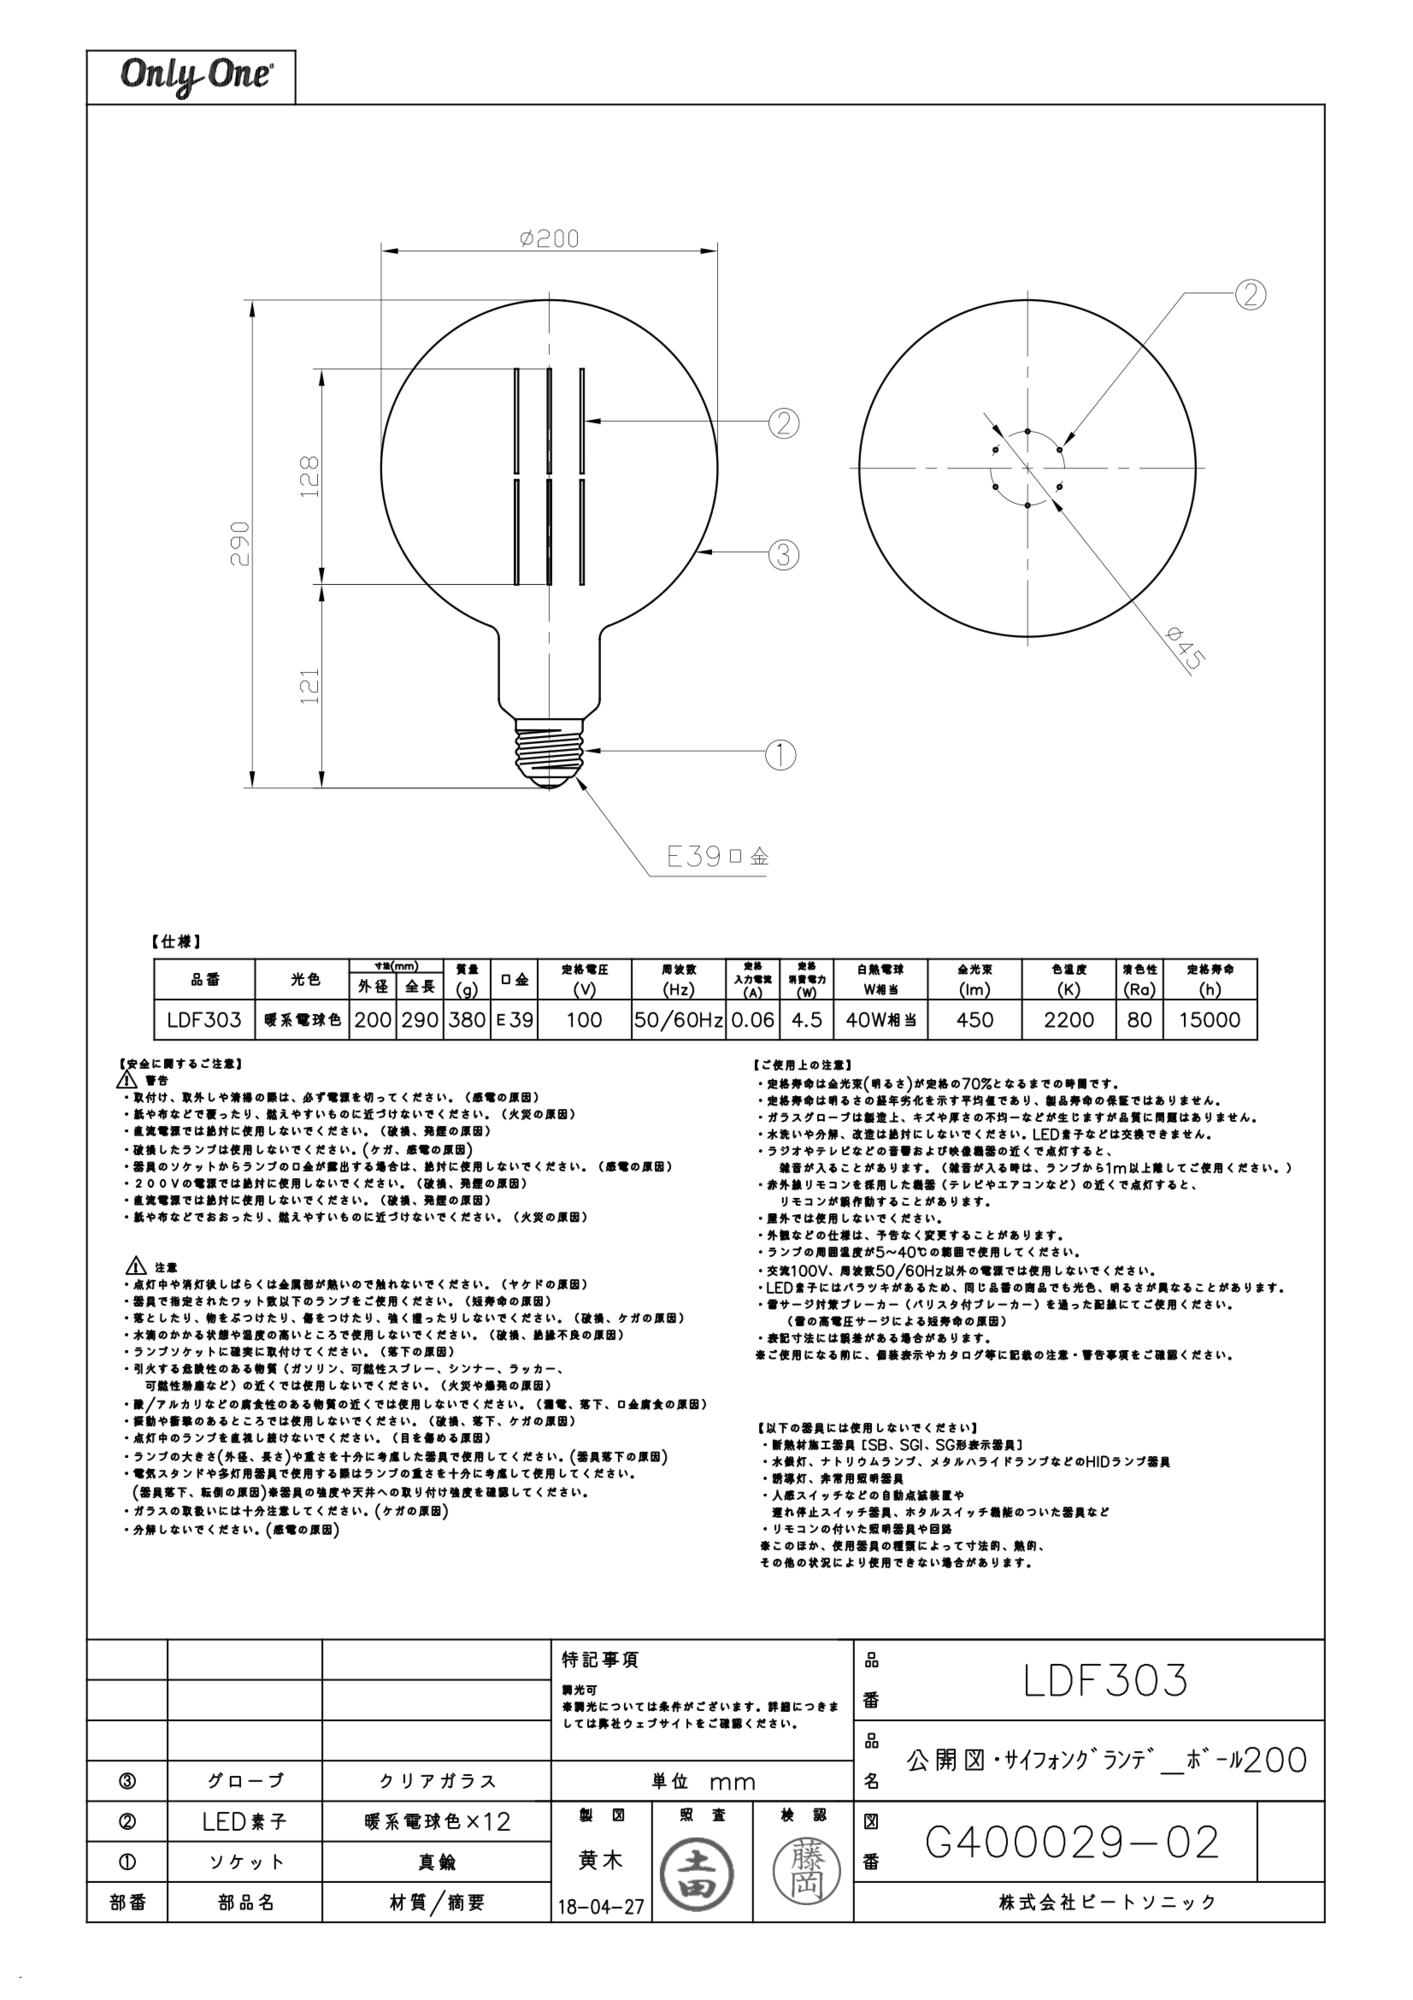 Middle e03ec0d466a02dab43b2